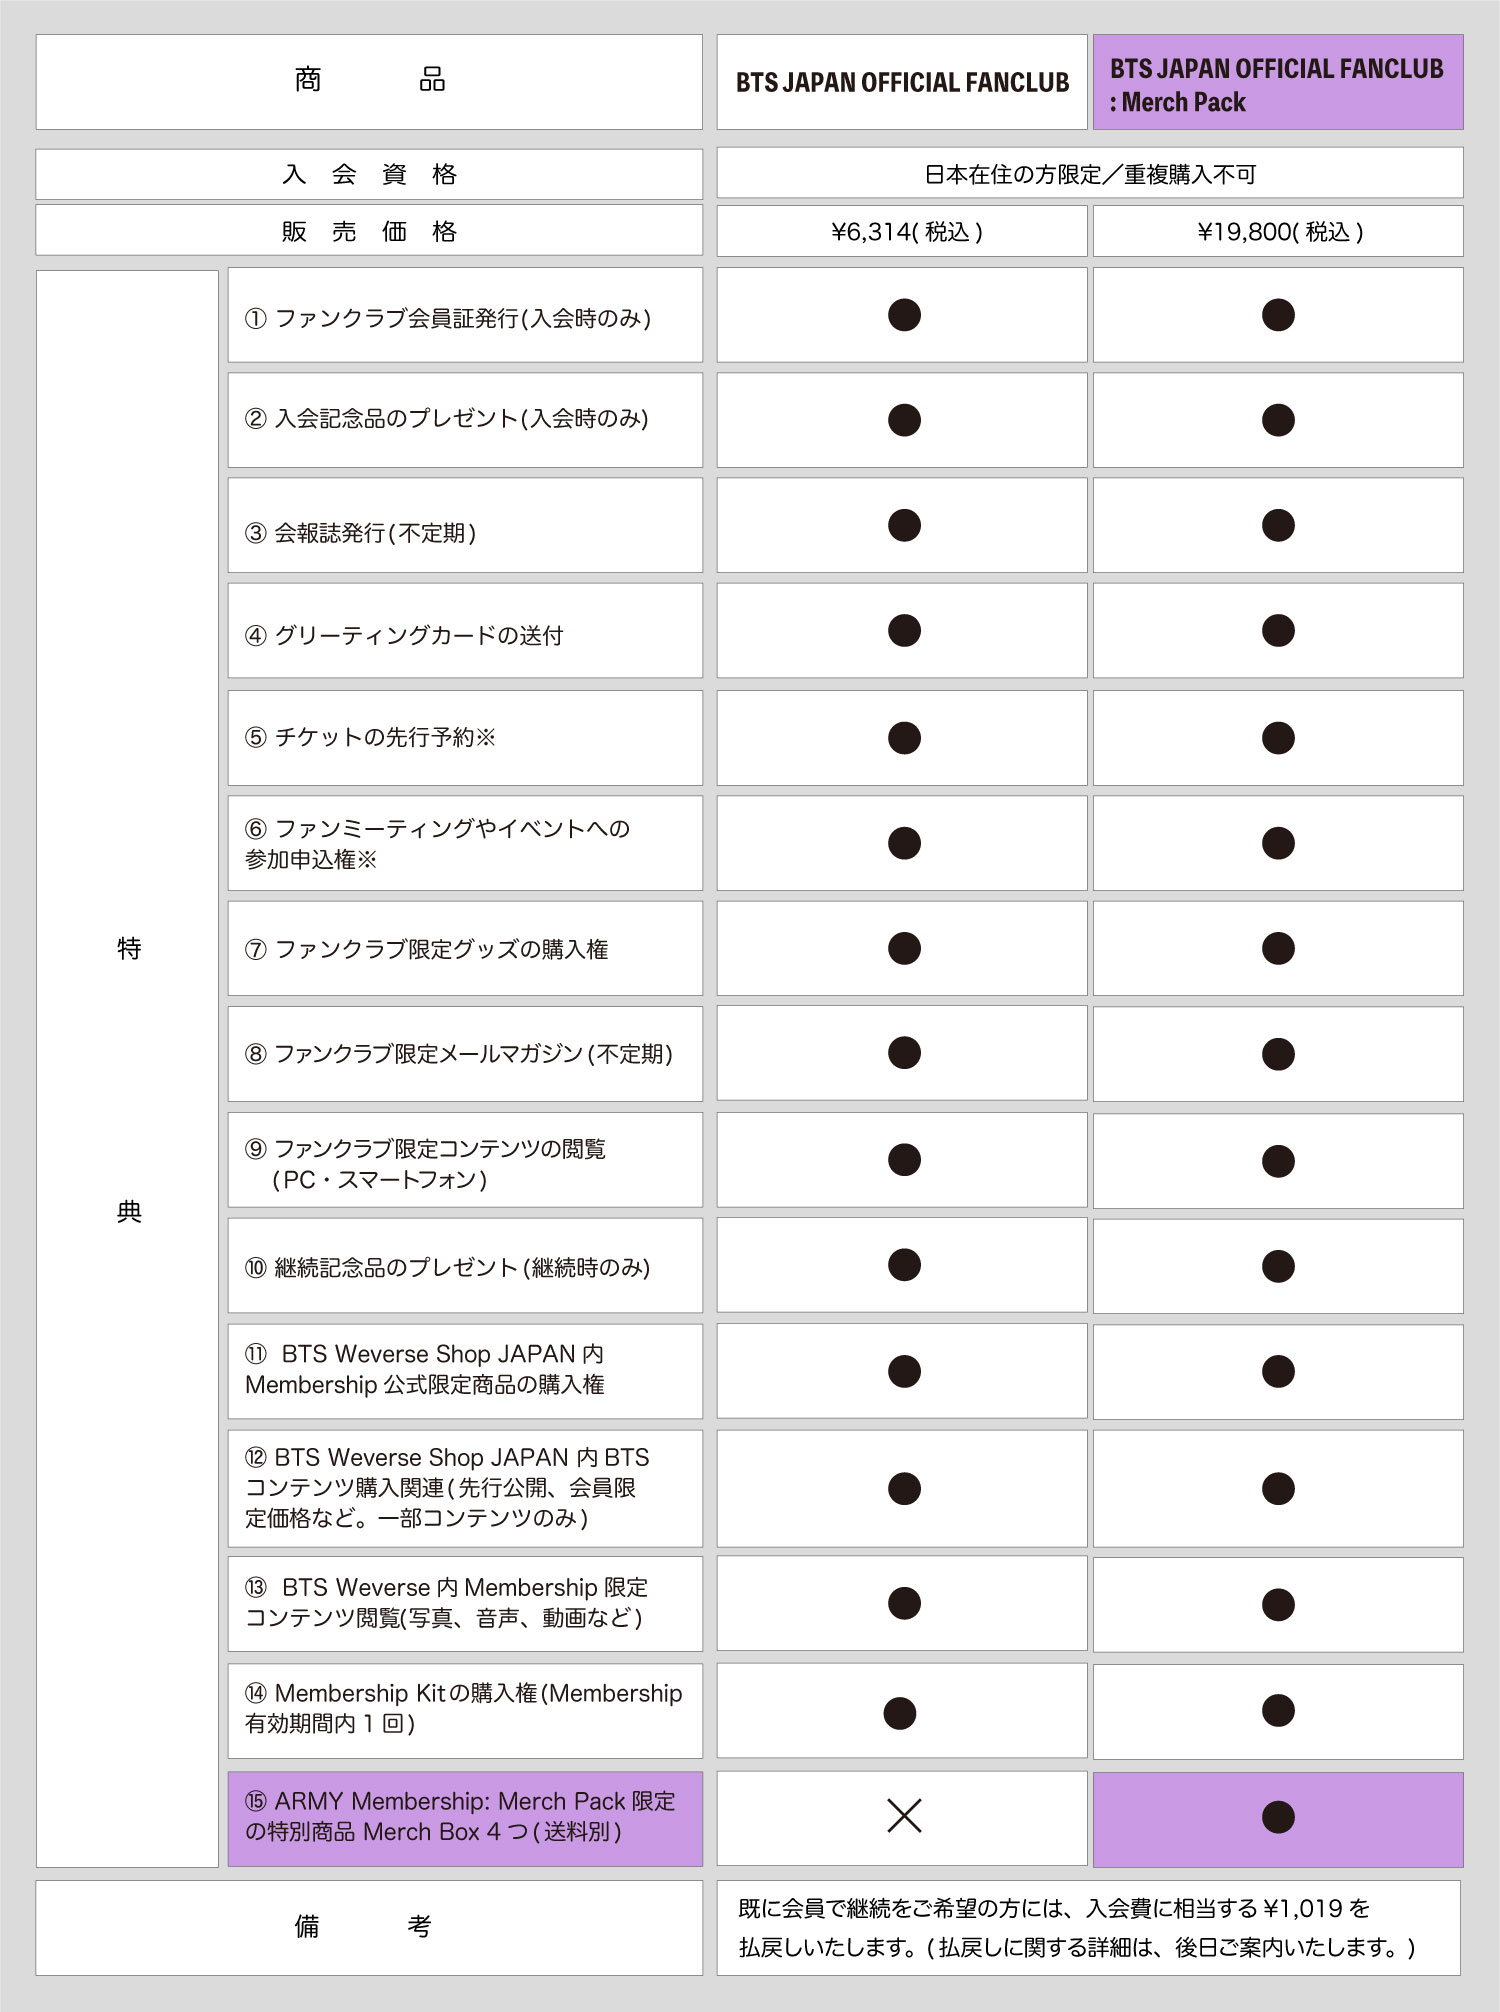 【BTS】日本ファンクラブ・入会方法は?値段・特典・継続方法